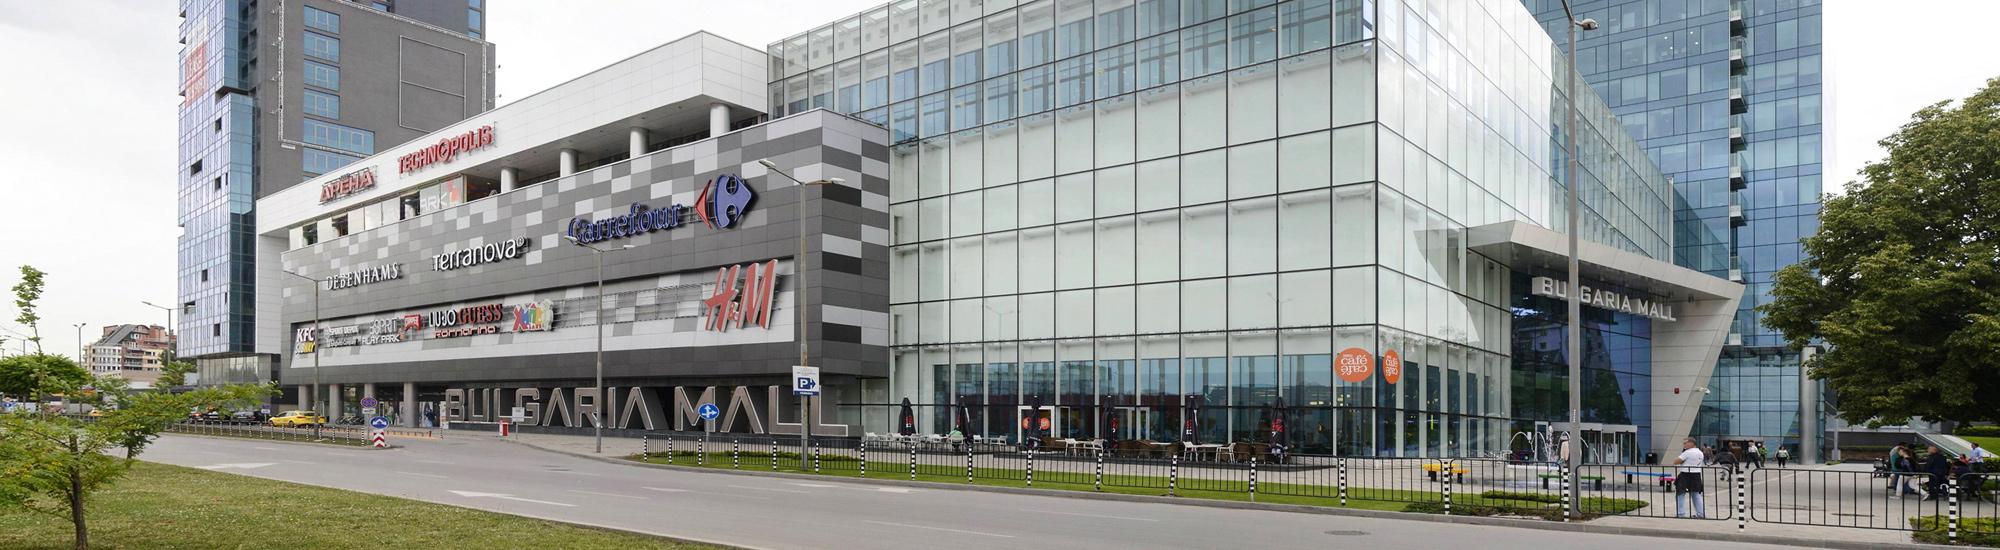 Kino Arena Deluks Bulgaria Mall